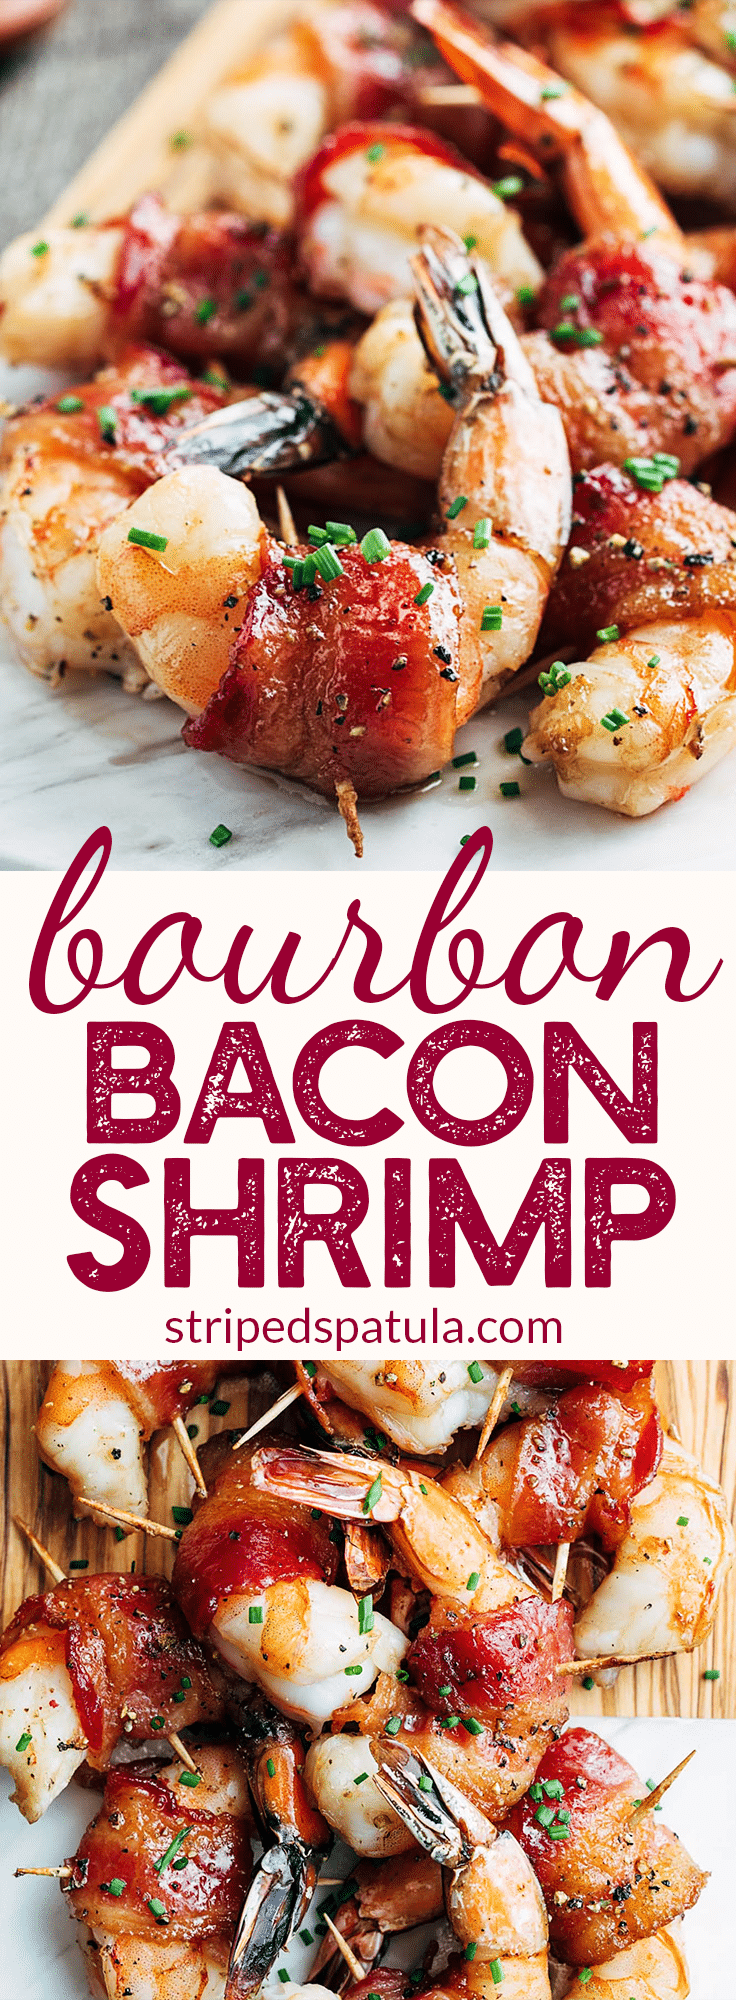 Bacon-Wrapped Shrimp with Bourbon Glaze